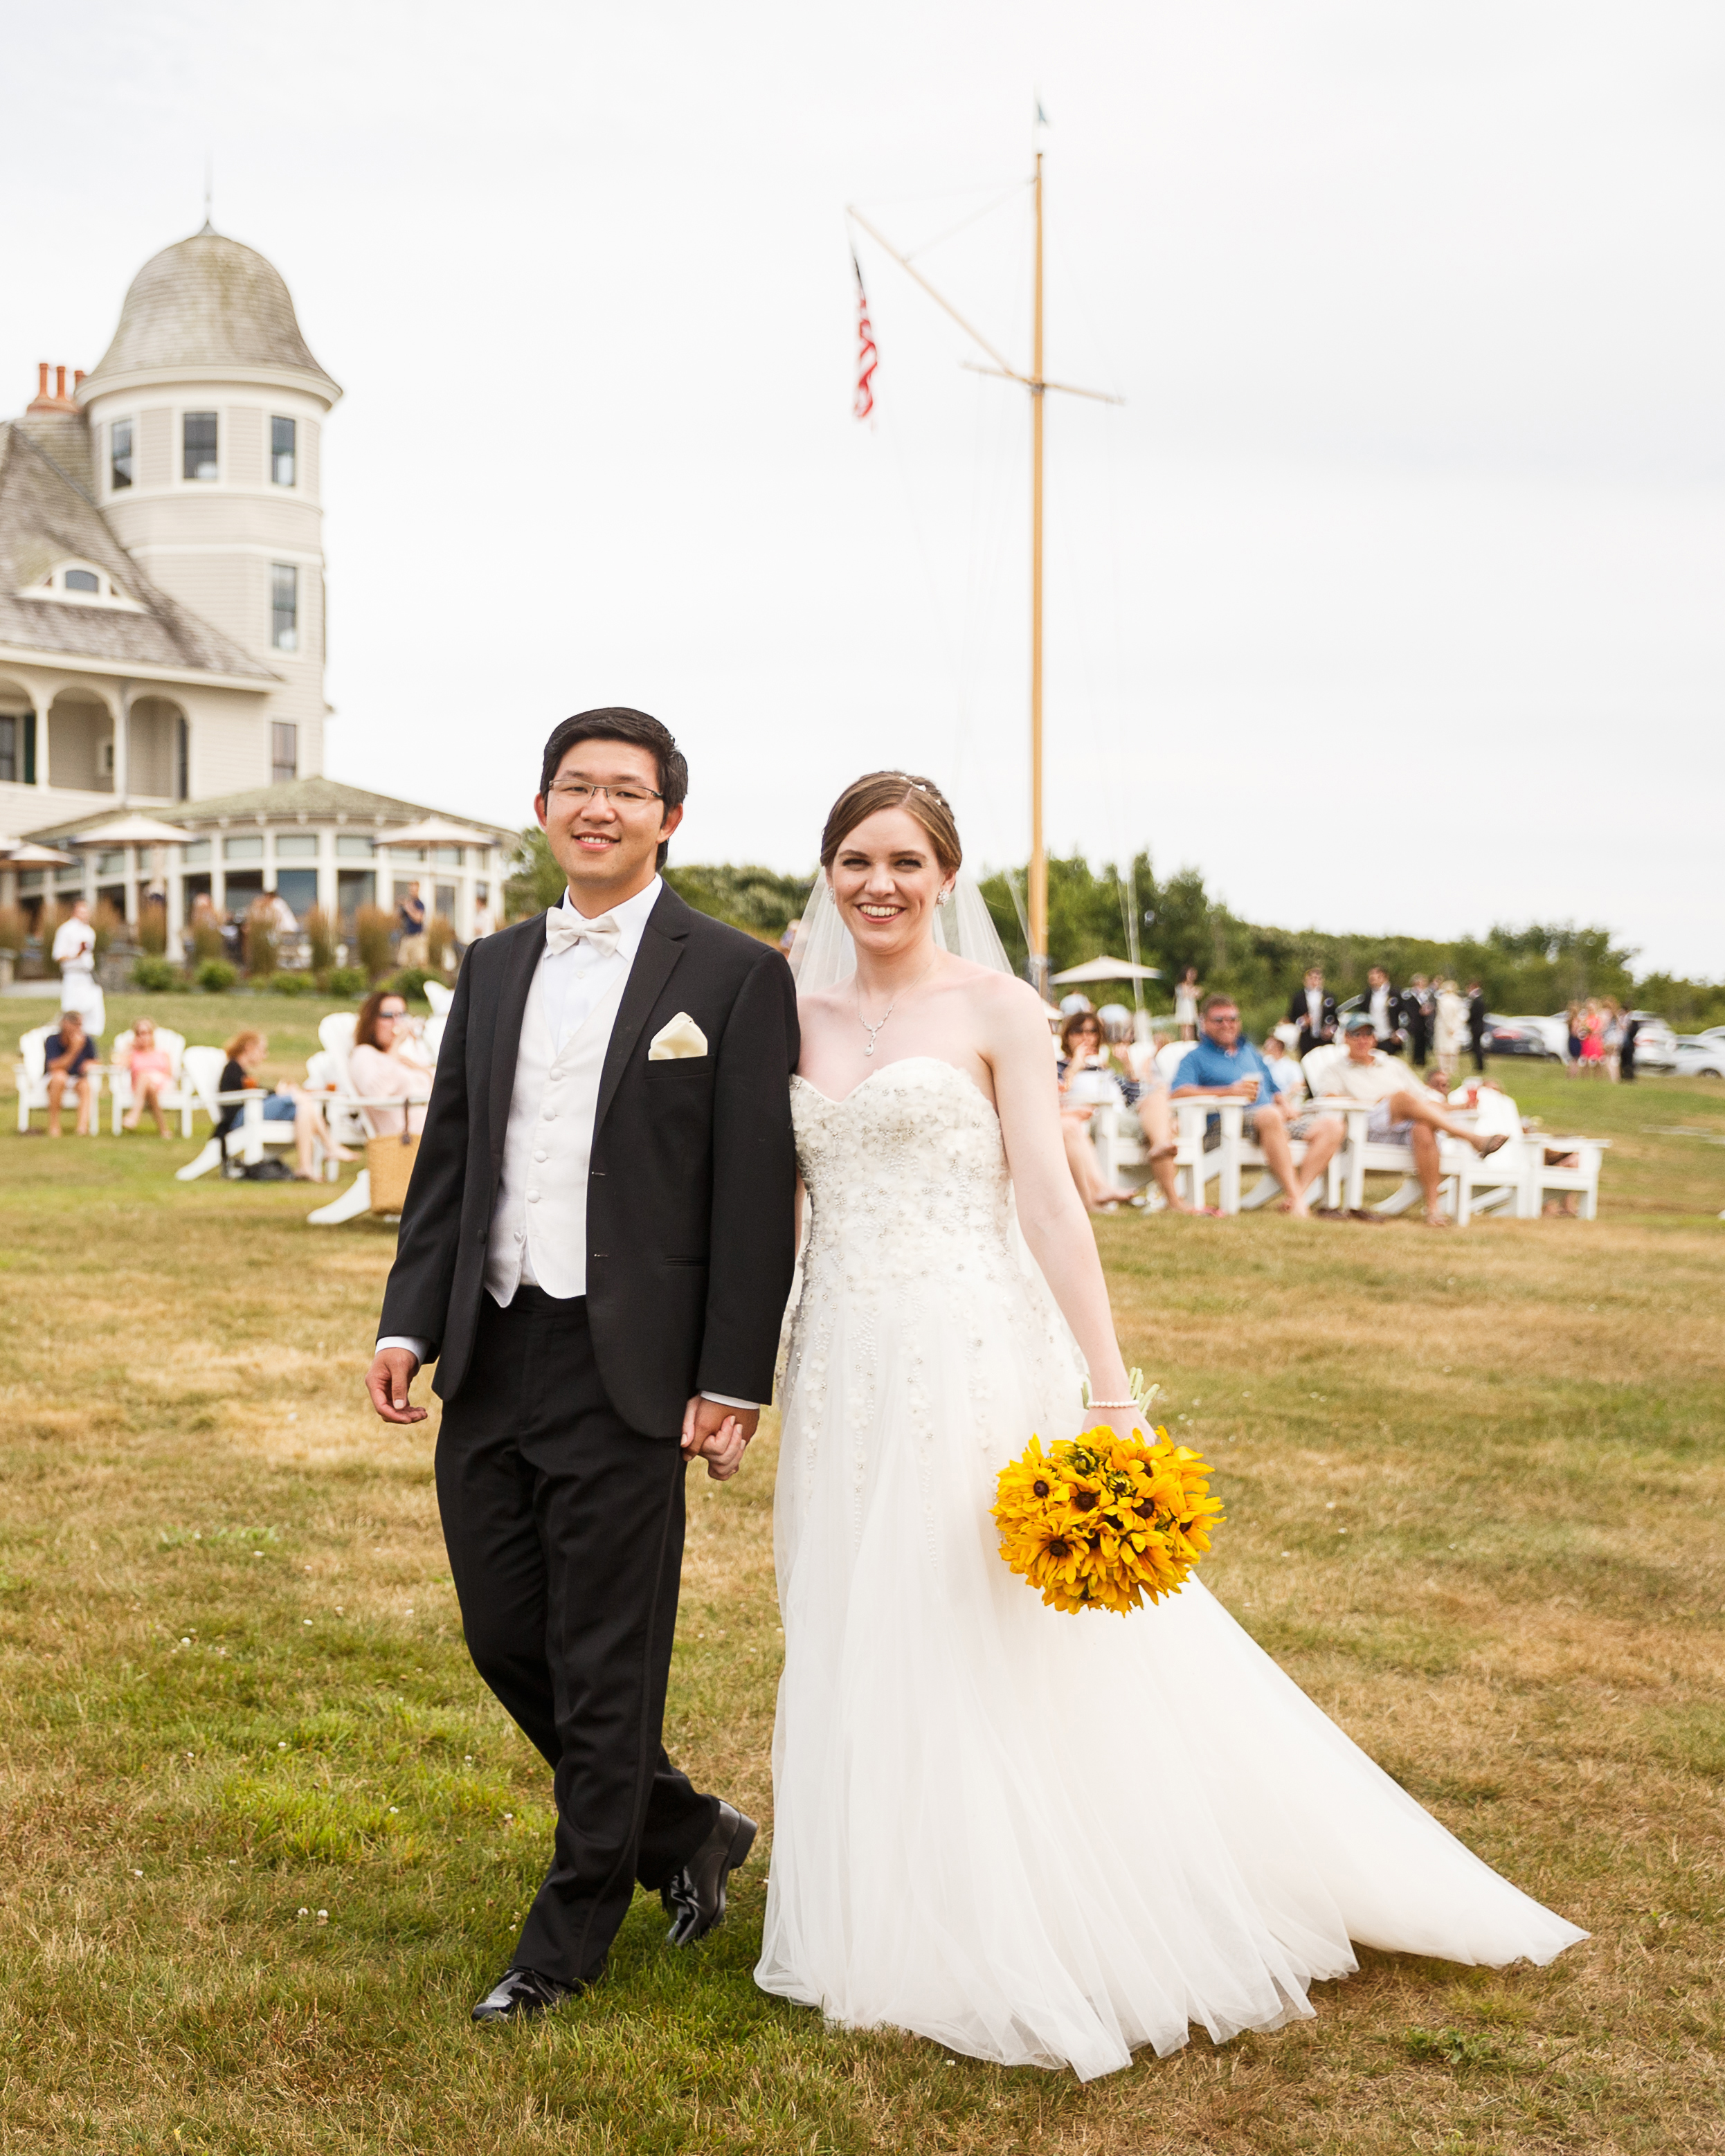 kristel-austin-wedding-couple-0783-s11860-0415.jpg